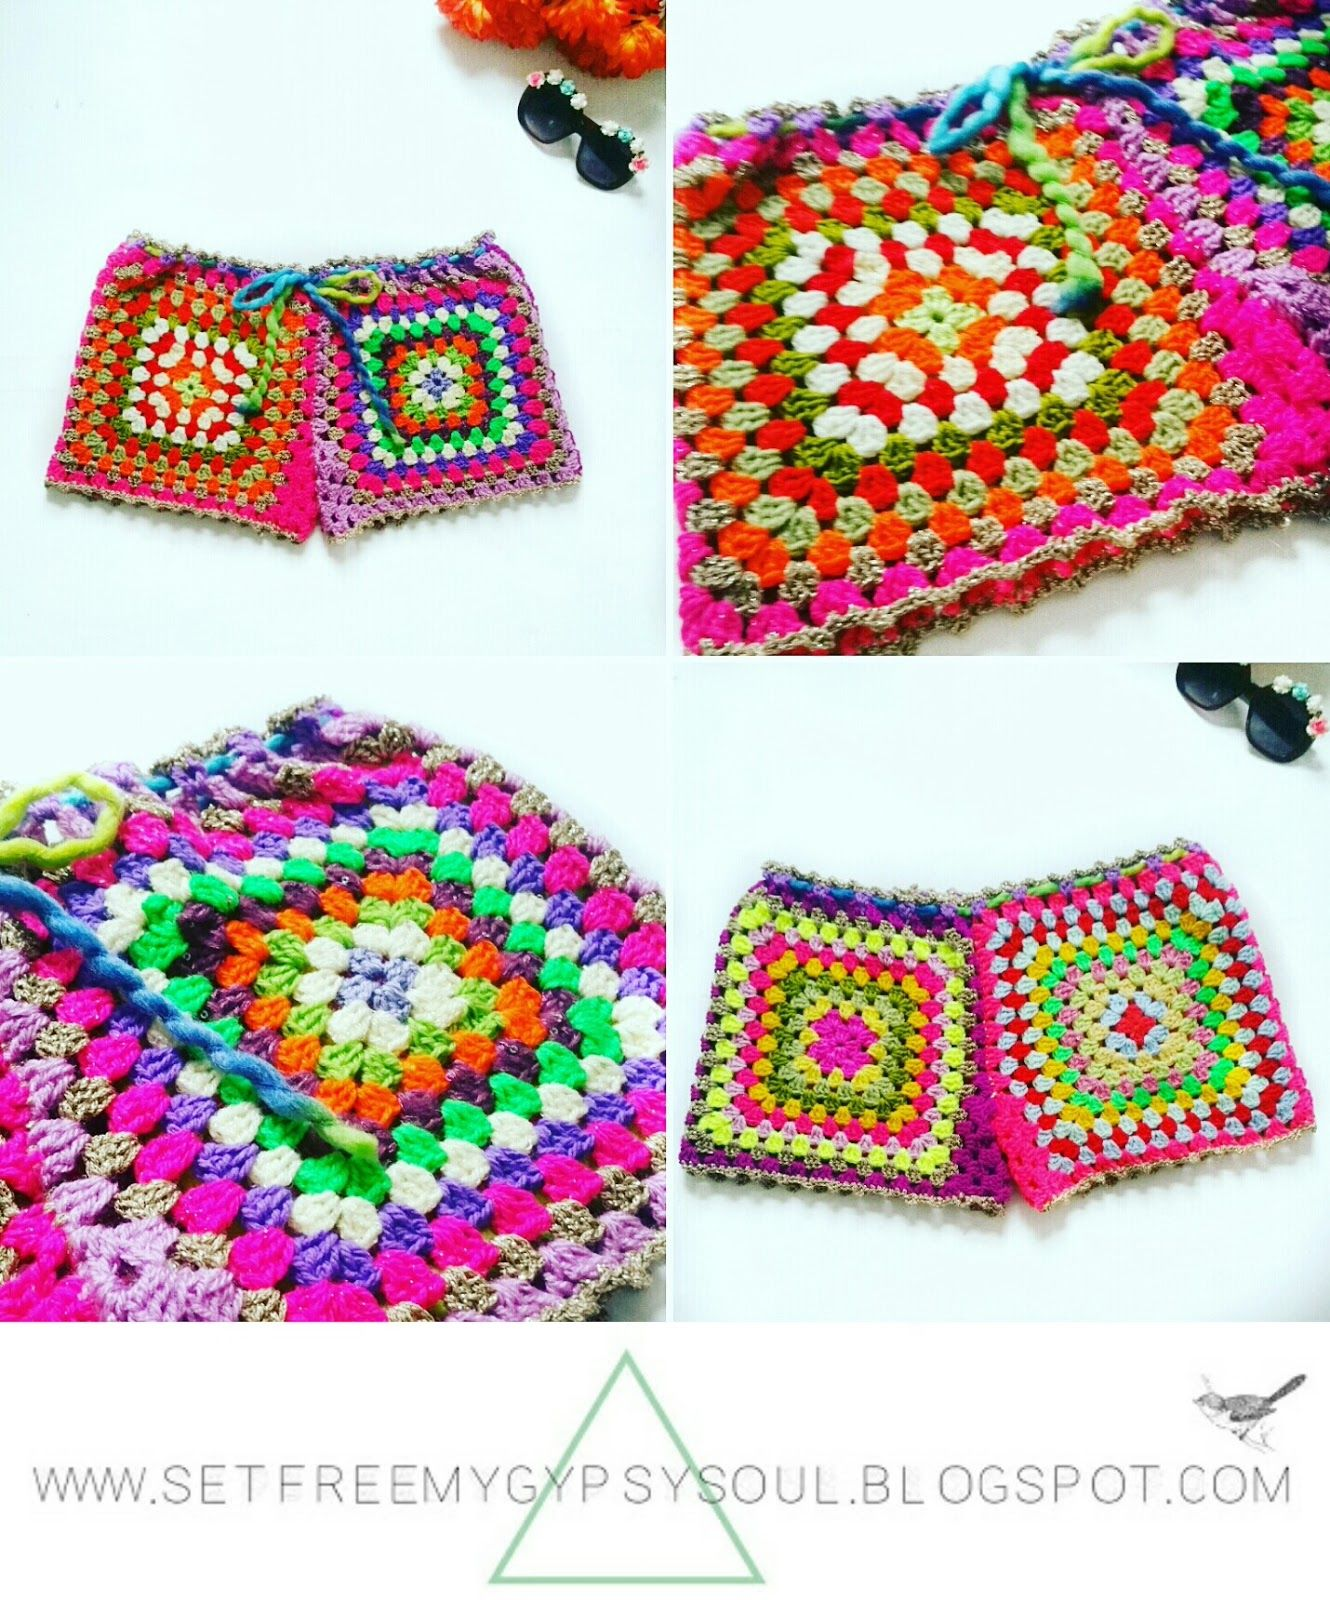 Set free my gypsy soul a bohemian craft and crochet blog set free my gypsy soul a bohemian craft and crochet blog granny square crochet bankloansurffo Choice Image